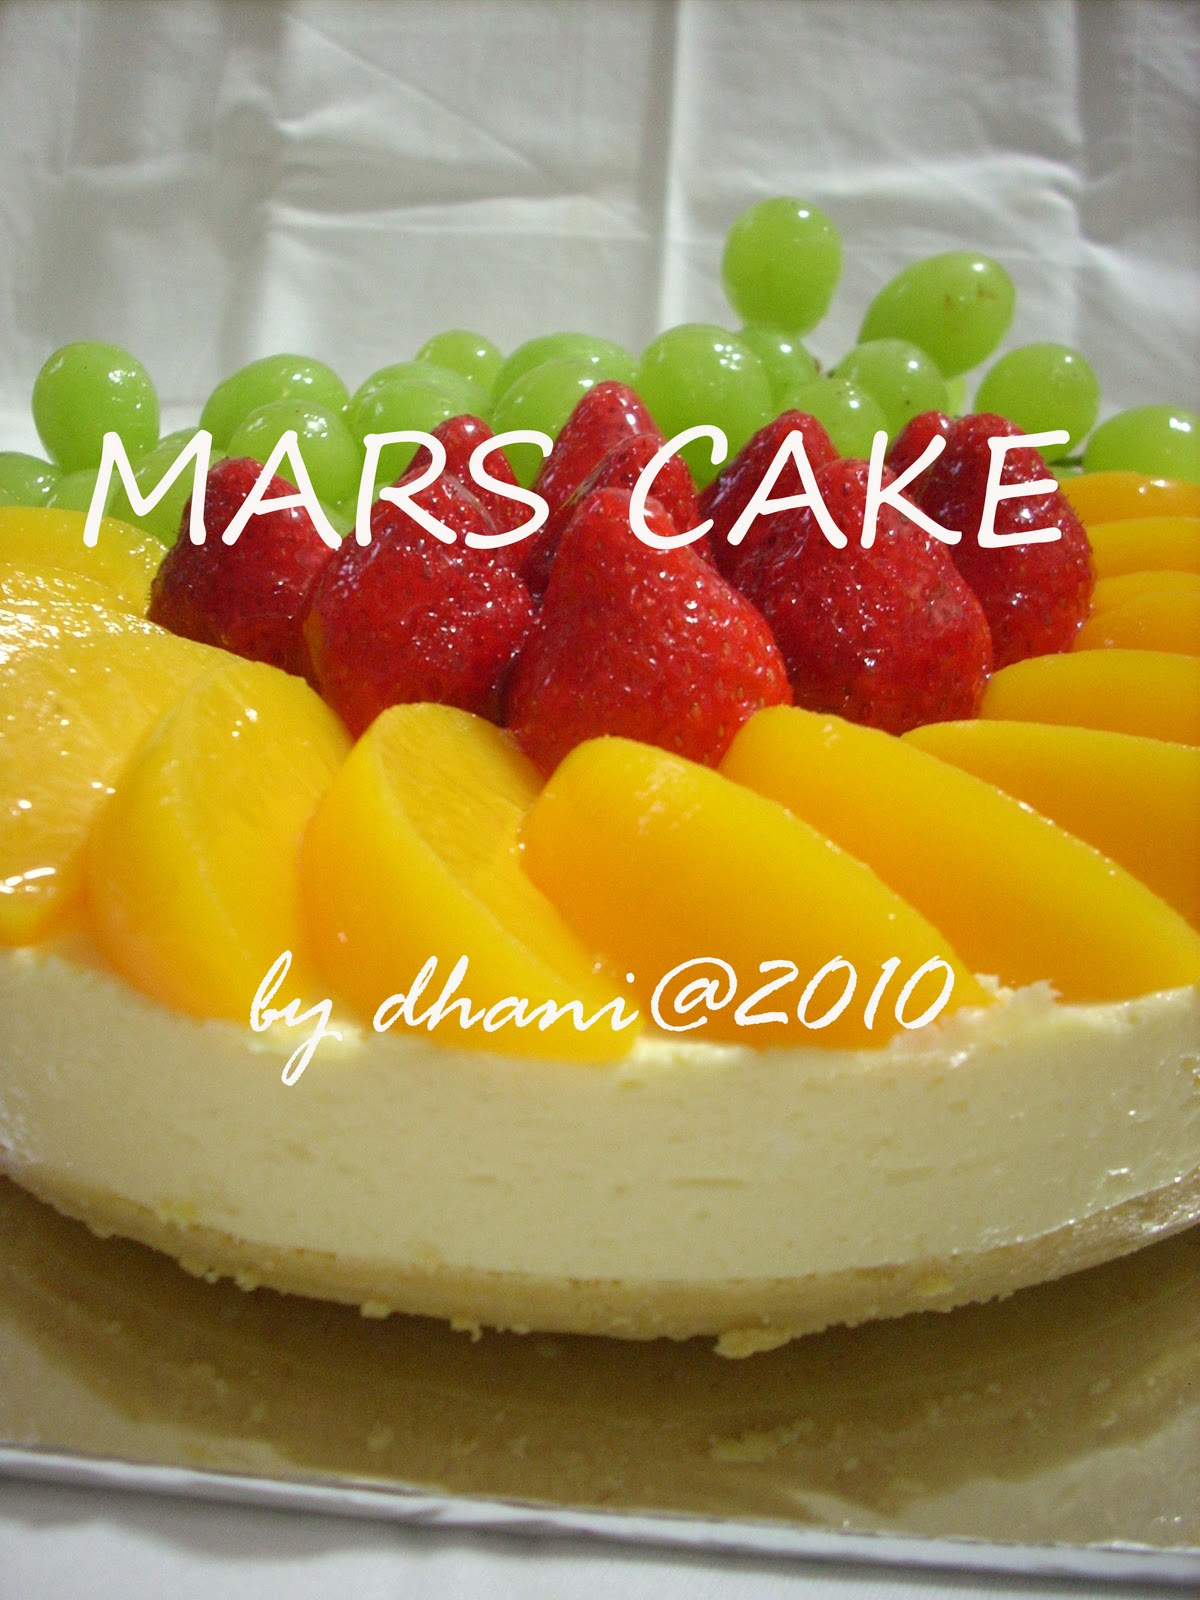 Mars Cake D H Marsstrawberry 2010 Brownies Kopi Aceh Varian By Tira Nad Fruit Cheese Lidia